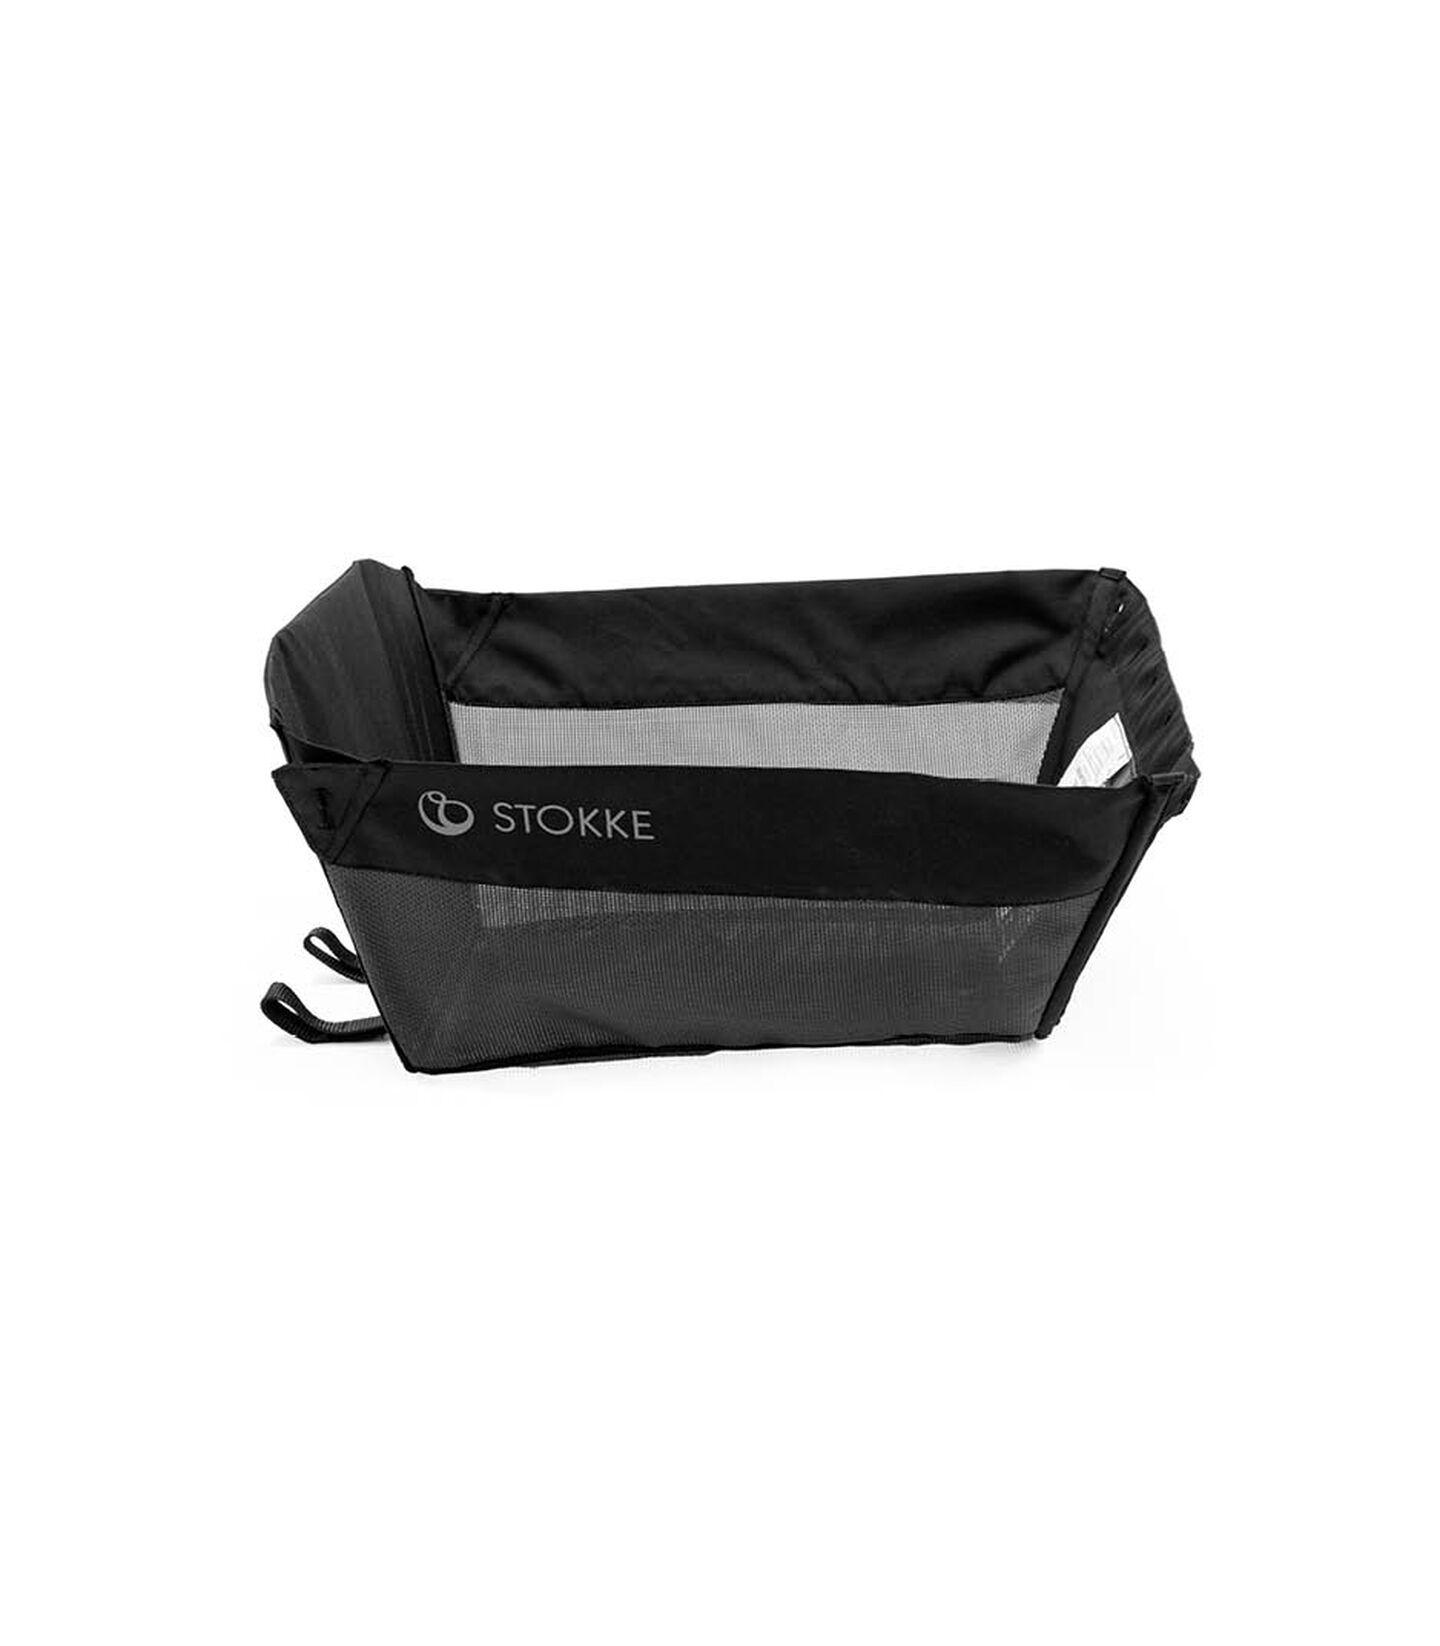 Stokke® Beat Shopping basket, , mainview view 2